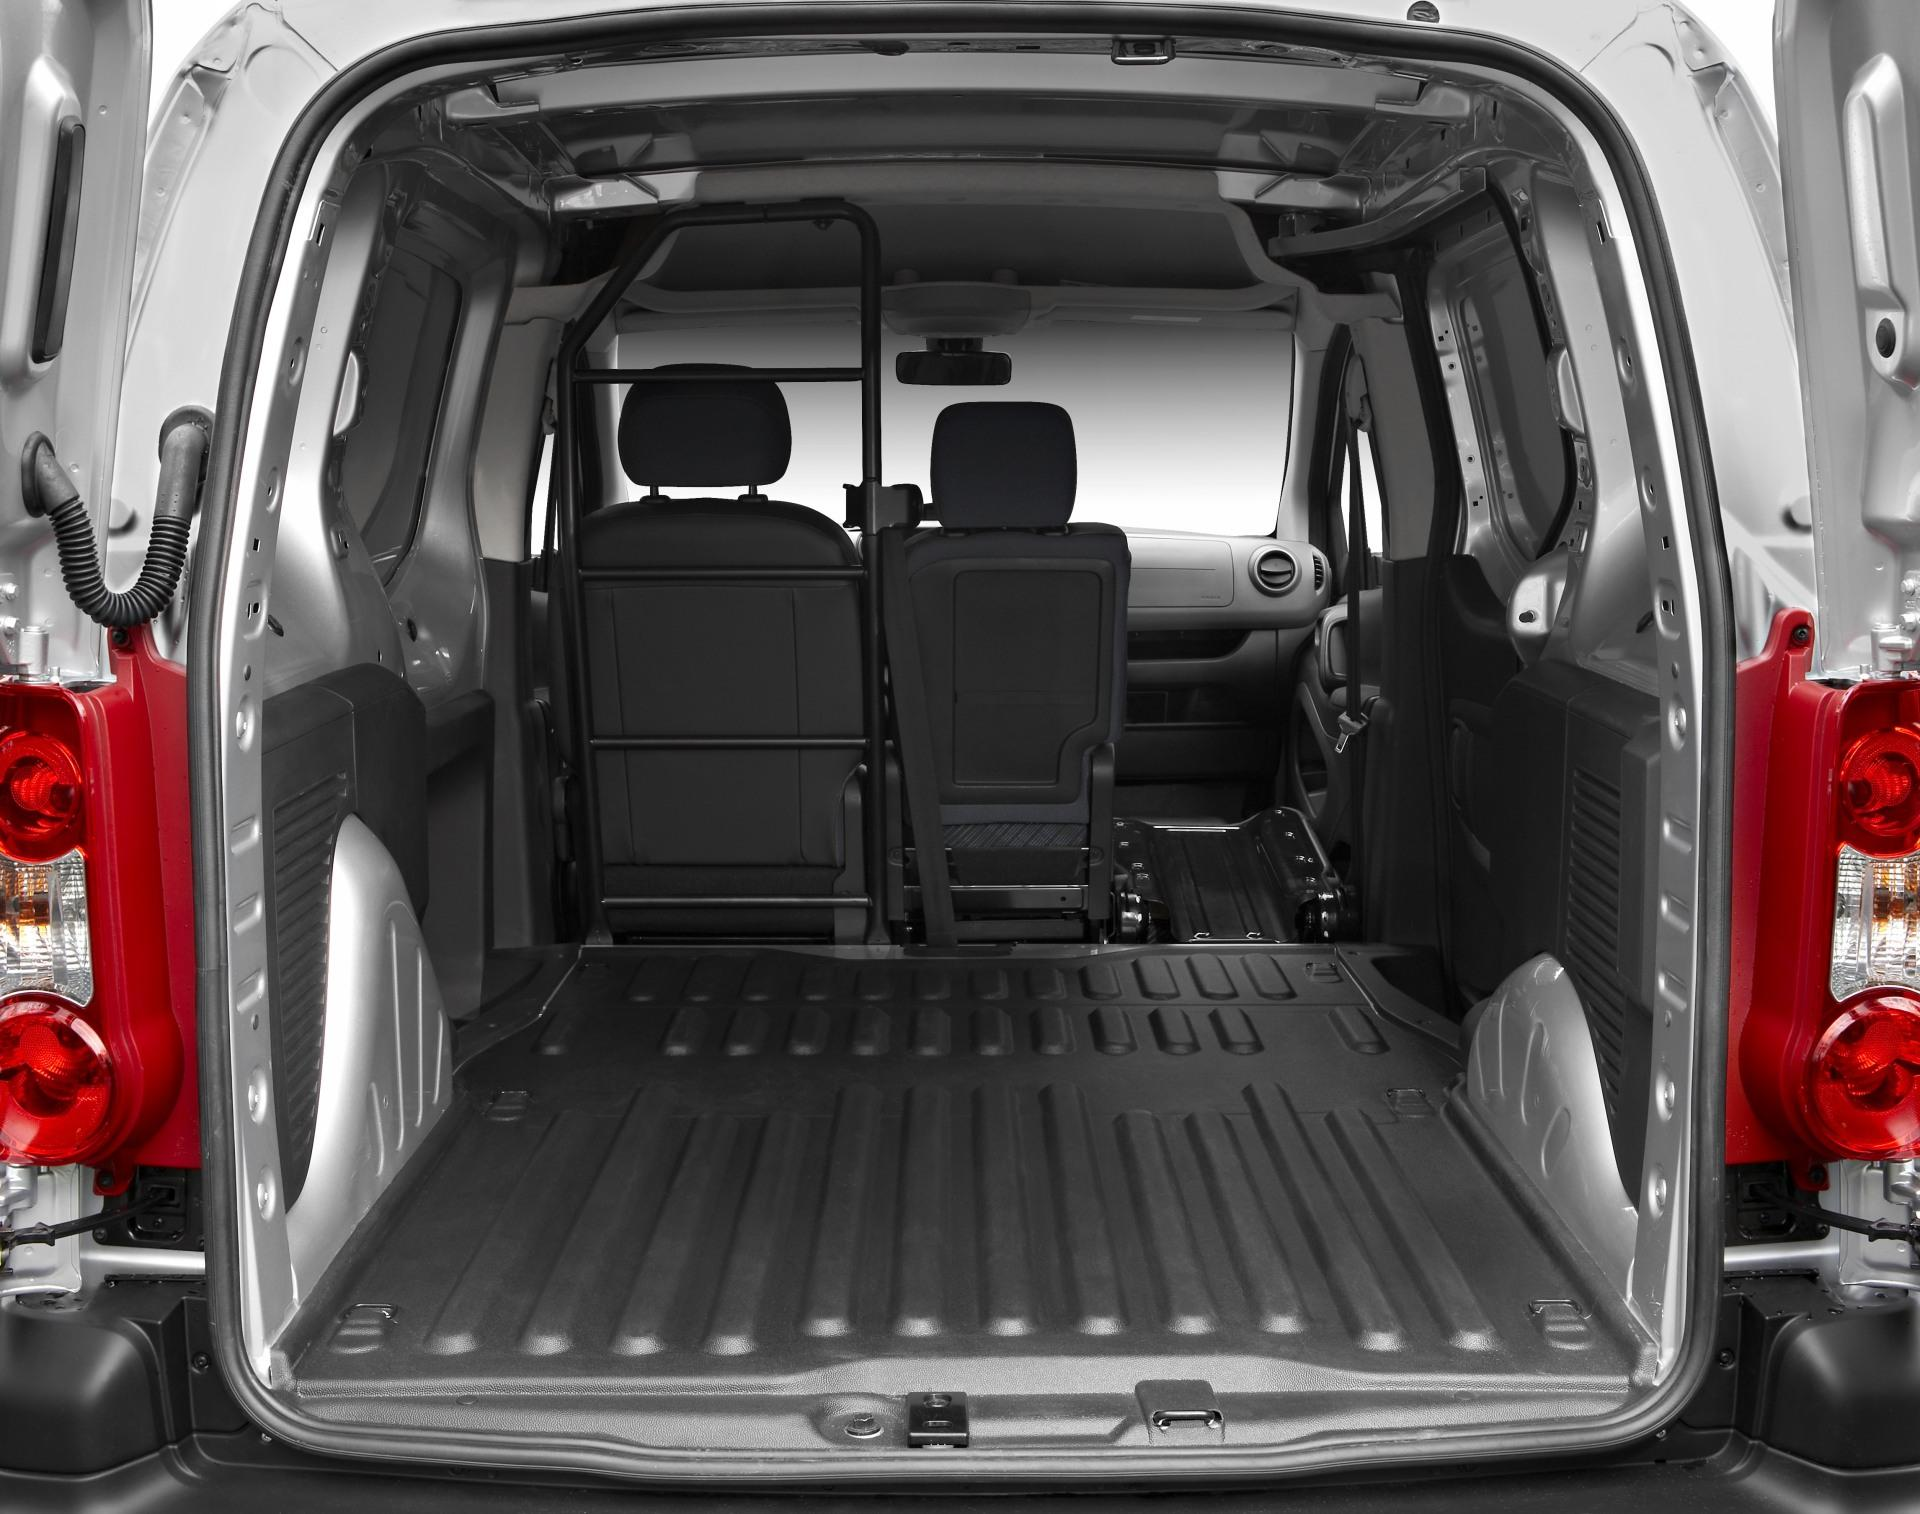 2009 Peugeot Partner Tepee Image